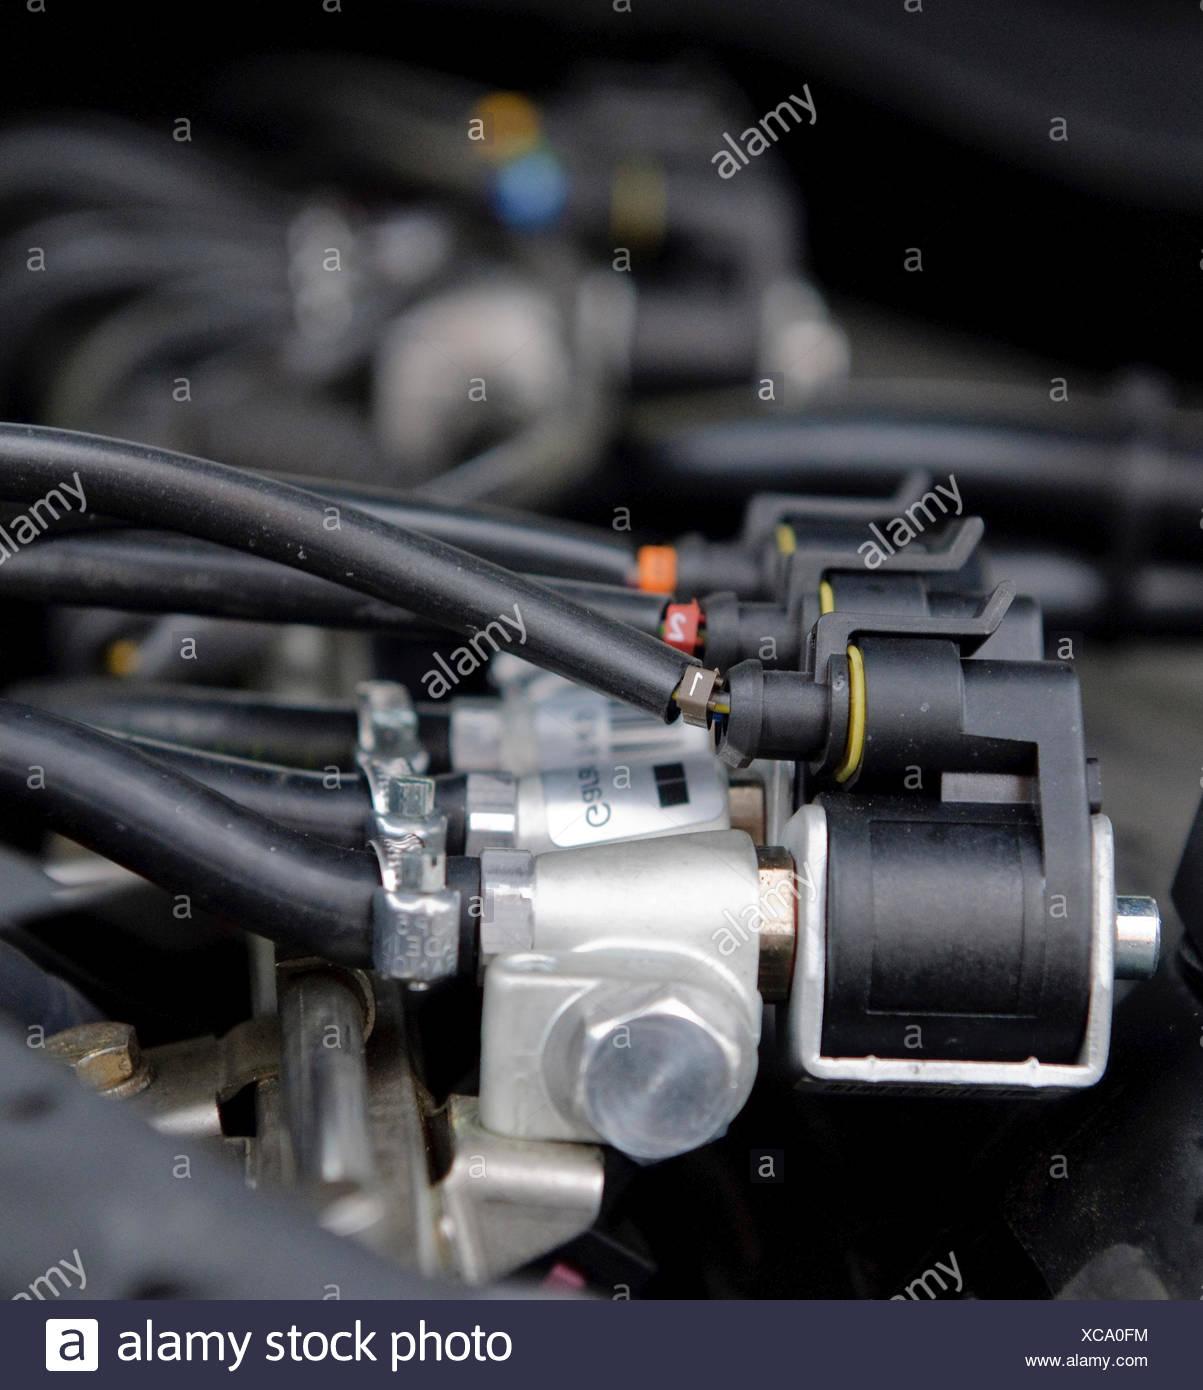 E3518-LPG Master Forge Gas Grill Model